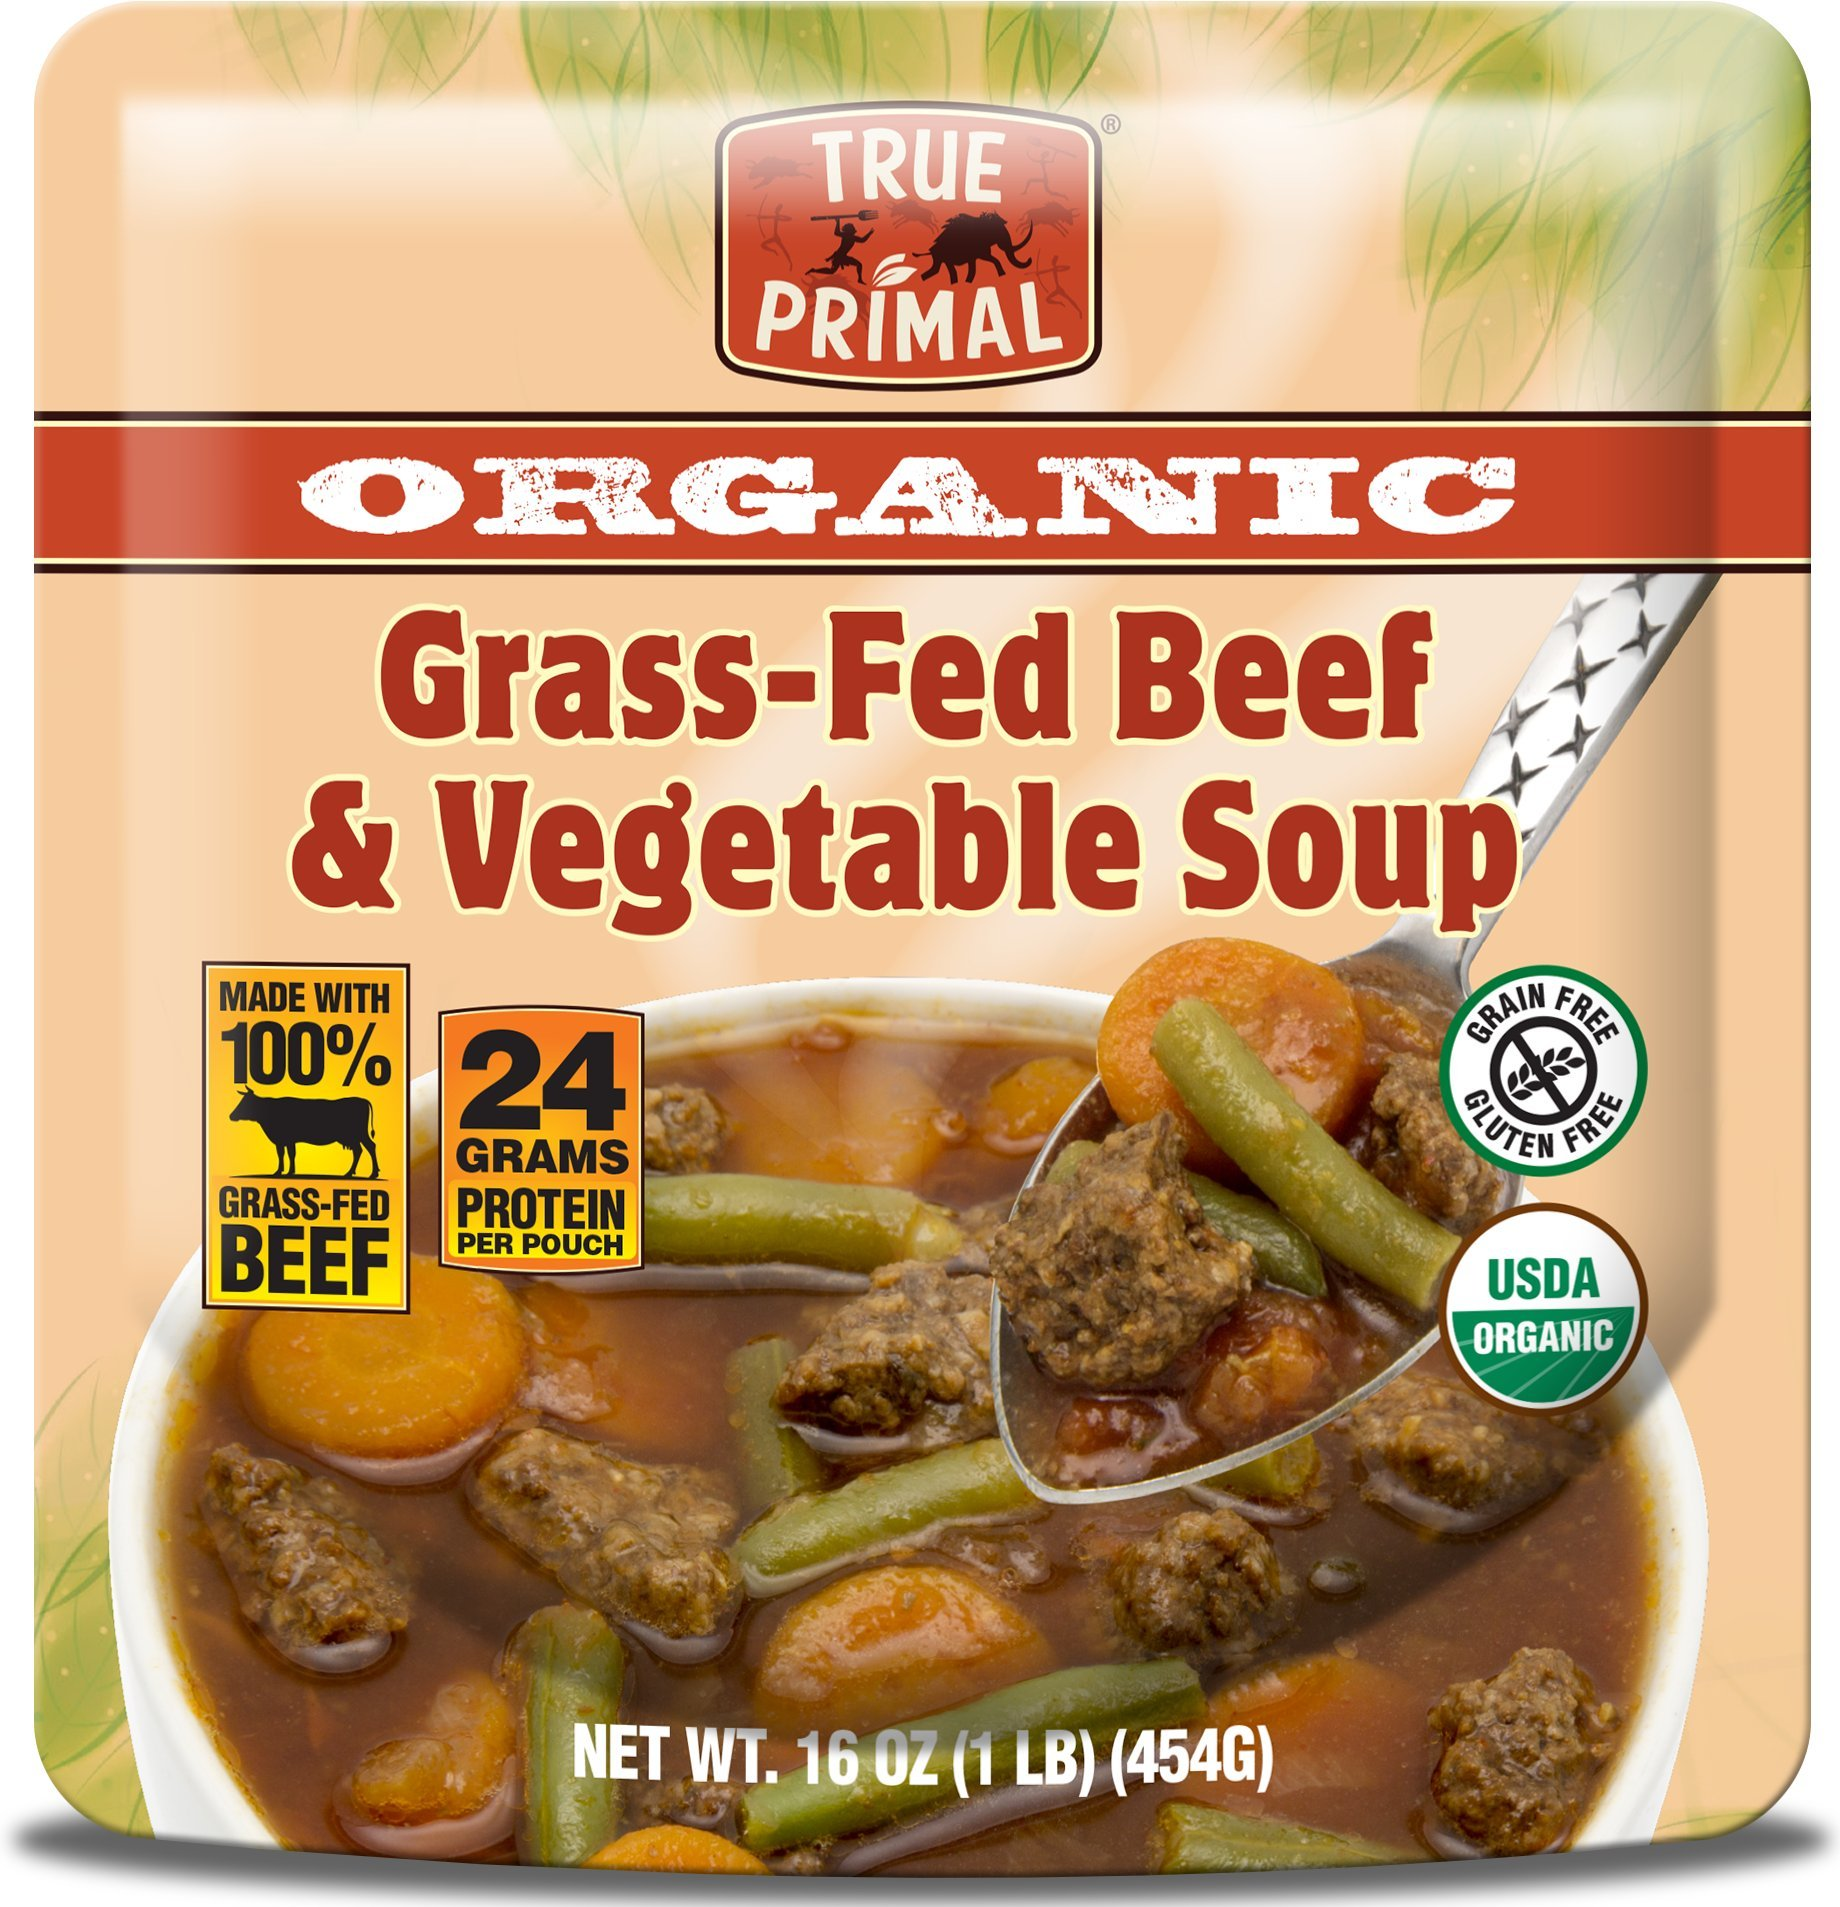 True Primal Organic Grass-Fed Beef & Vegetable Soup (Gluten-free, Paleo) 10-pack